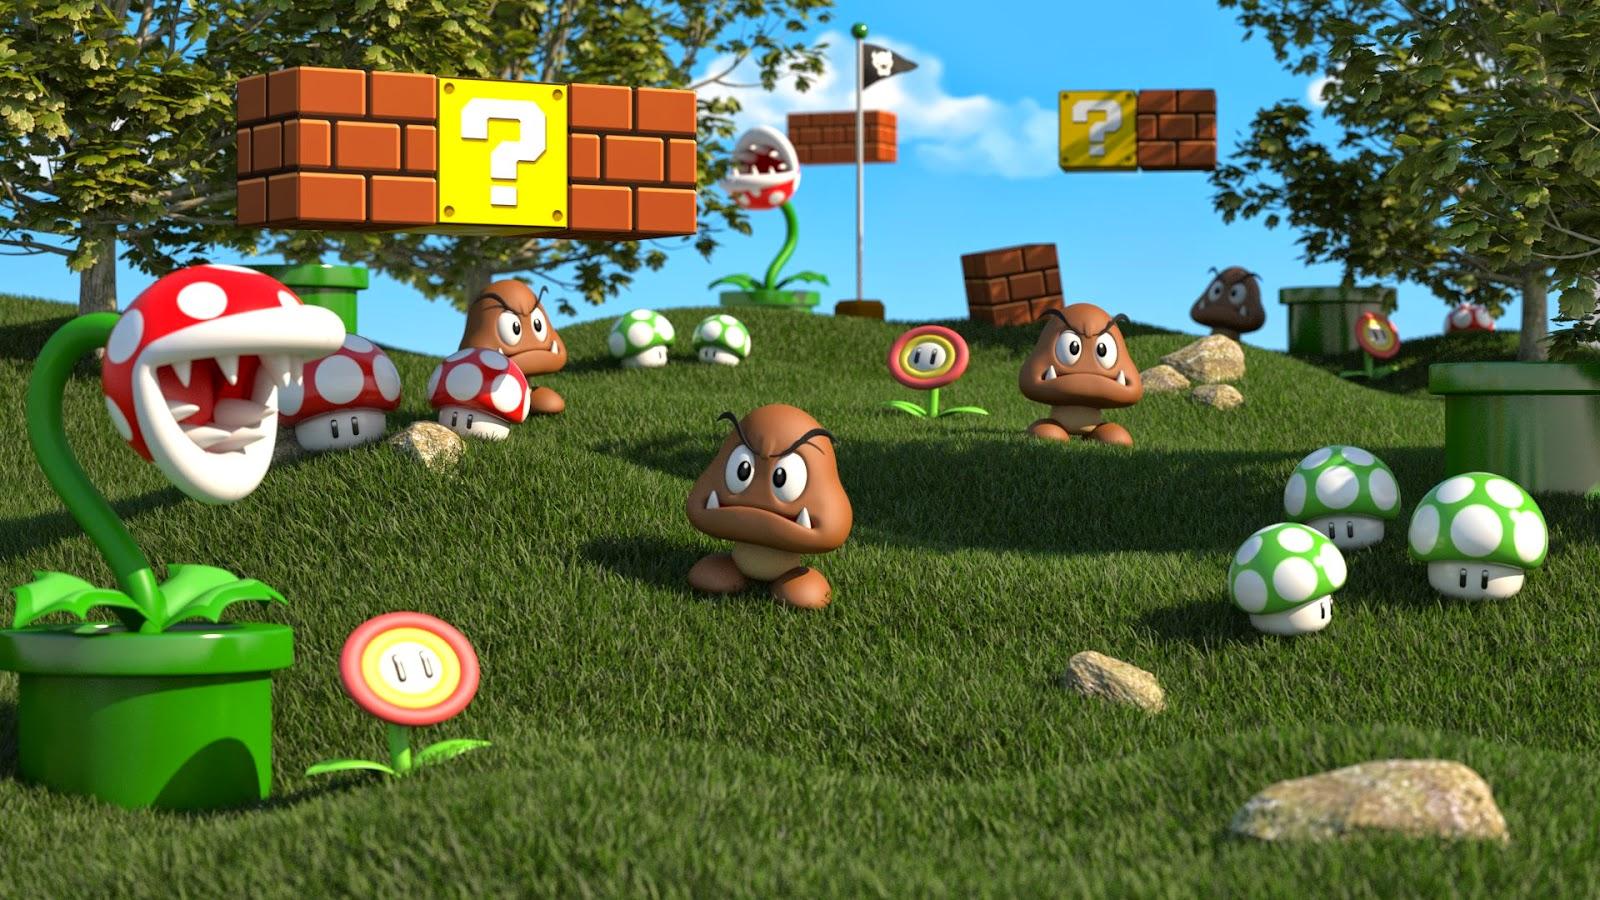 next gen mario game wii u new super mario brothers bros graphics 2015